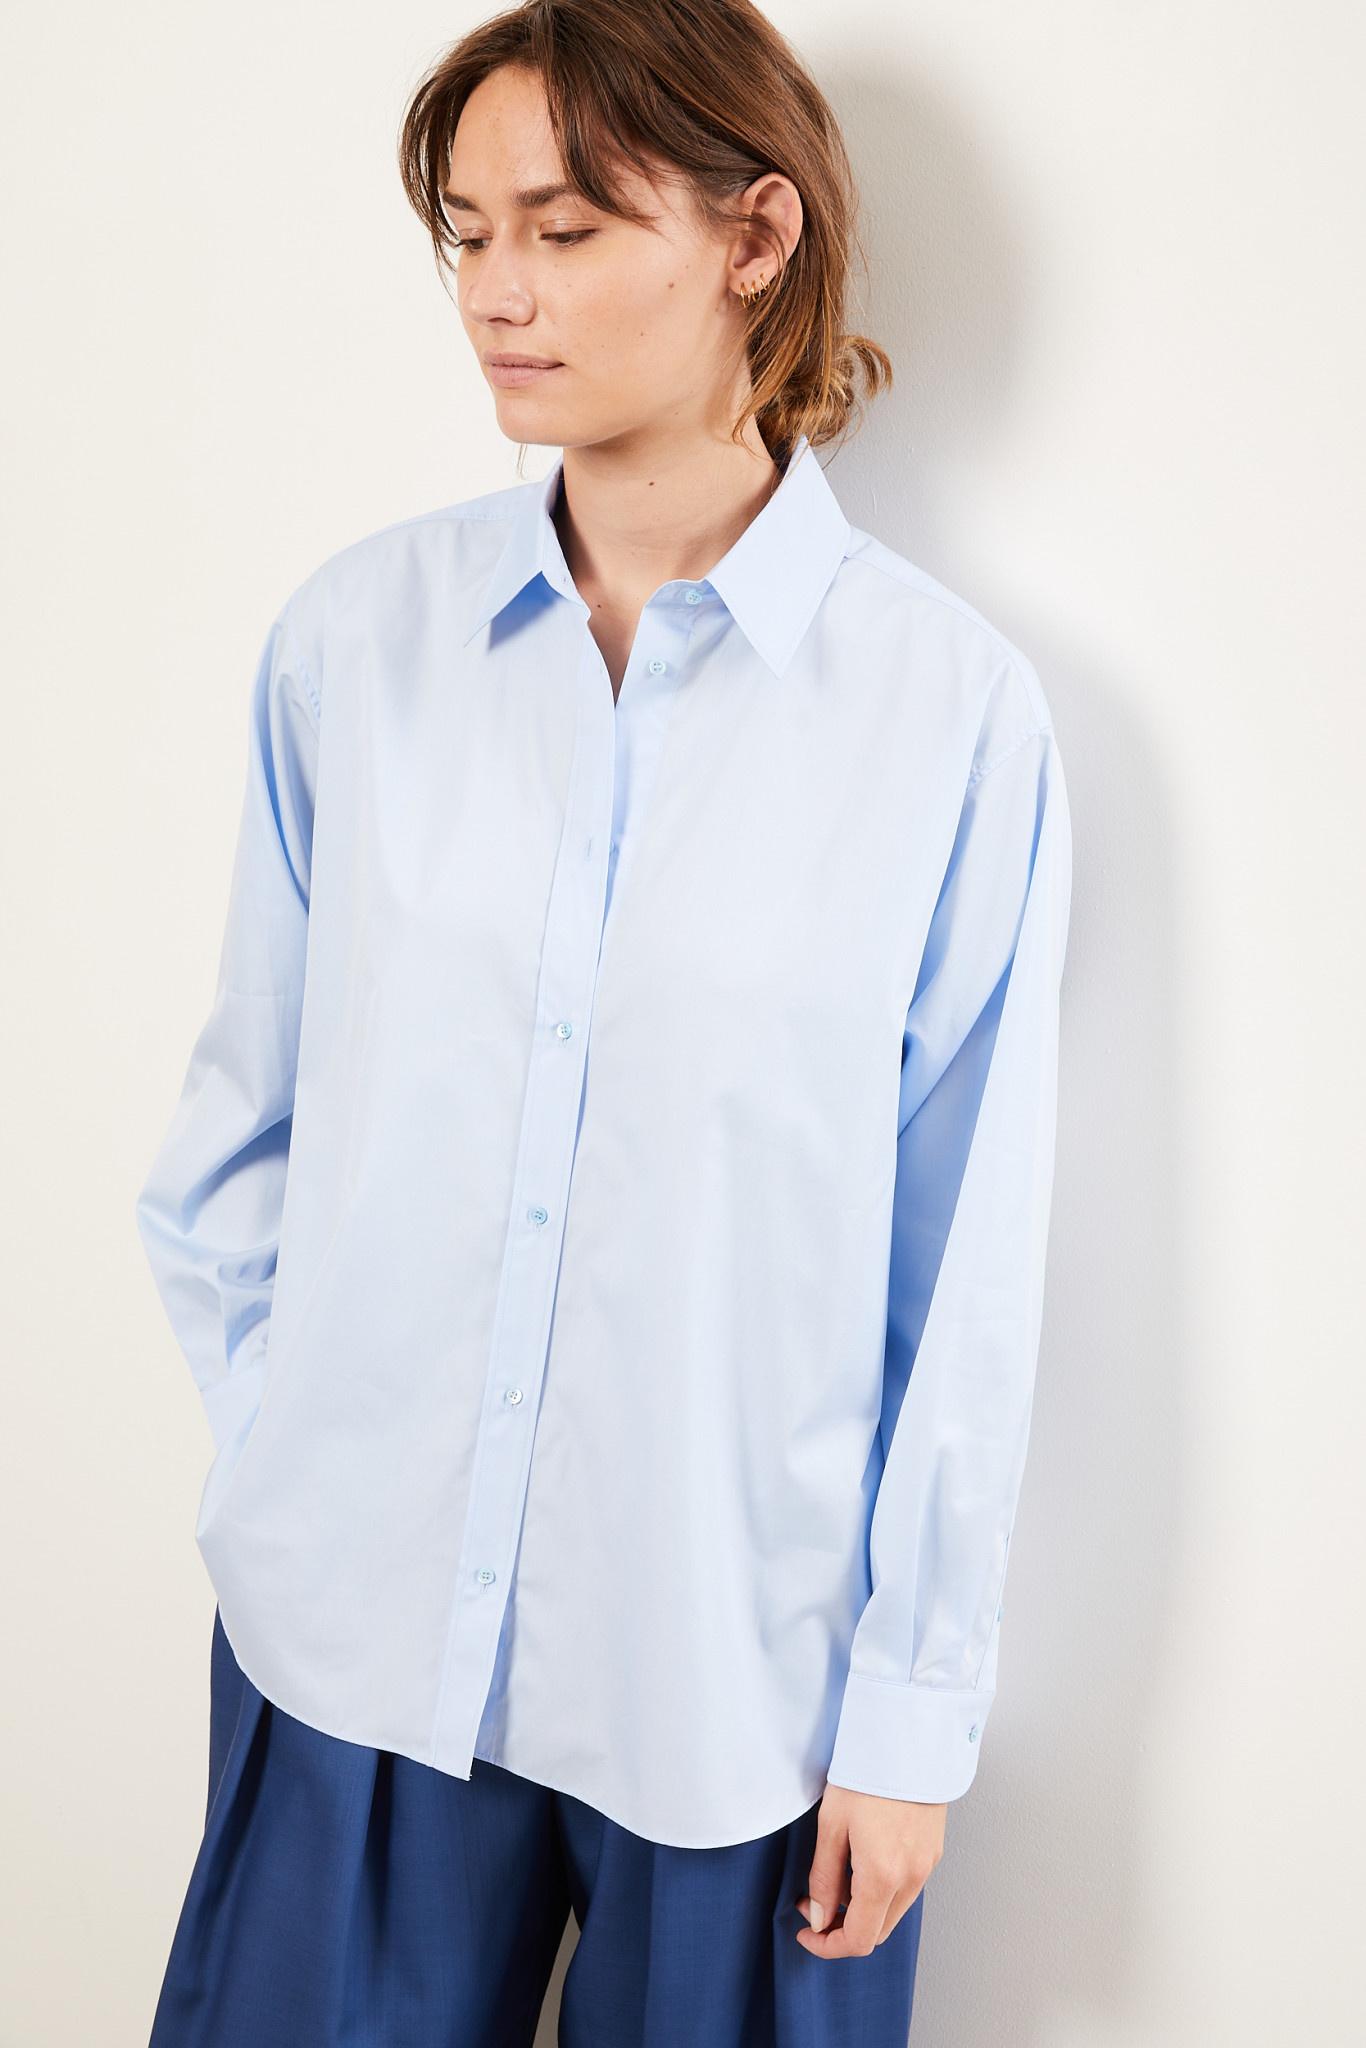 inDRESS - Coriandre shirt